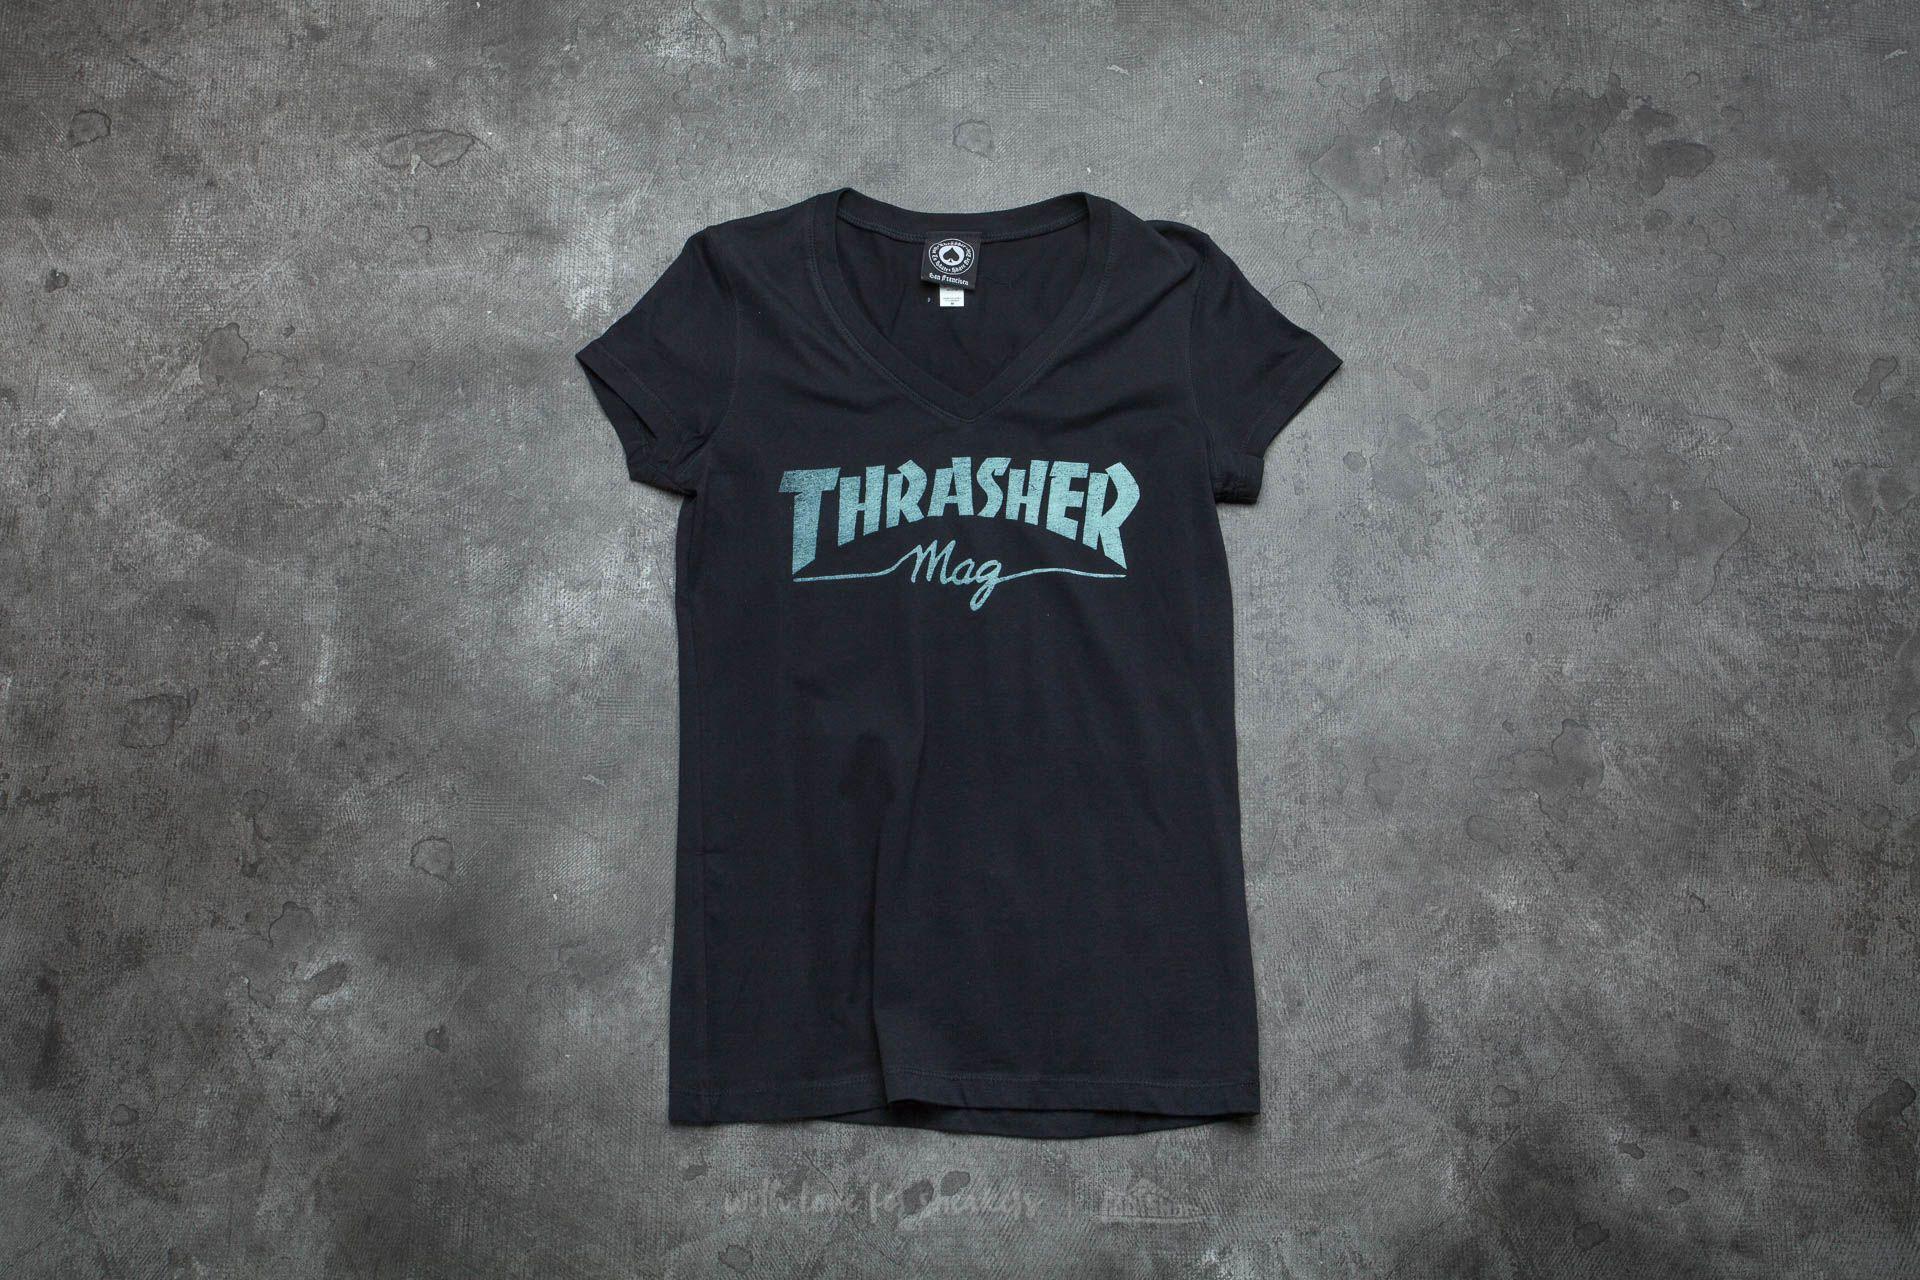 e46455129f0f Thrasher Girls Mag Logo V-Neck T-Shirt Black